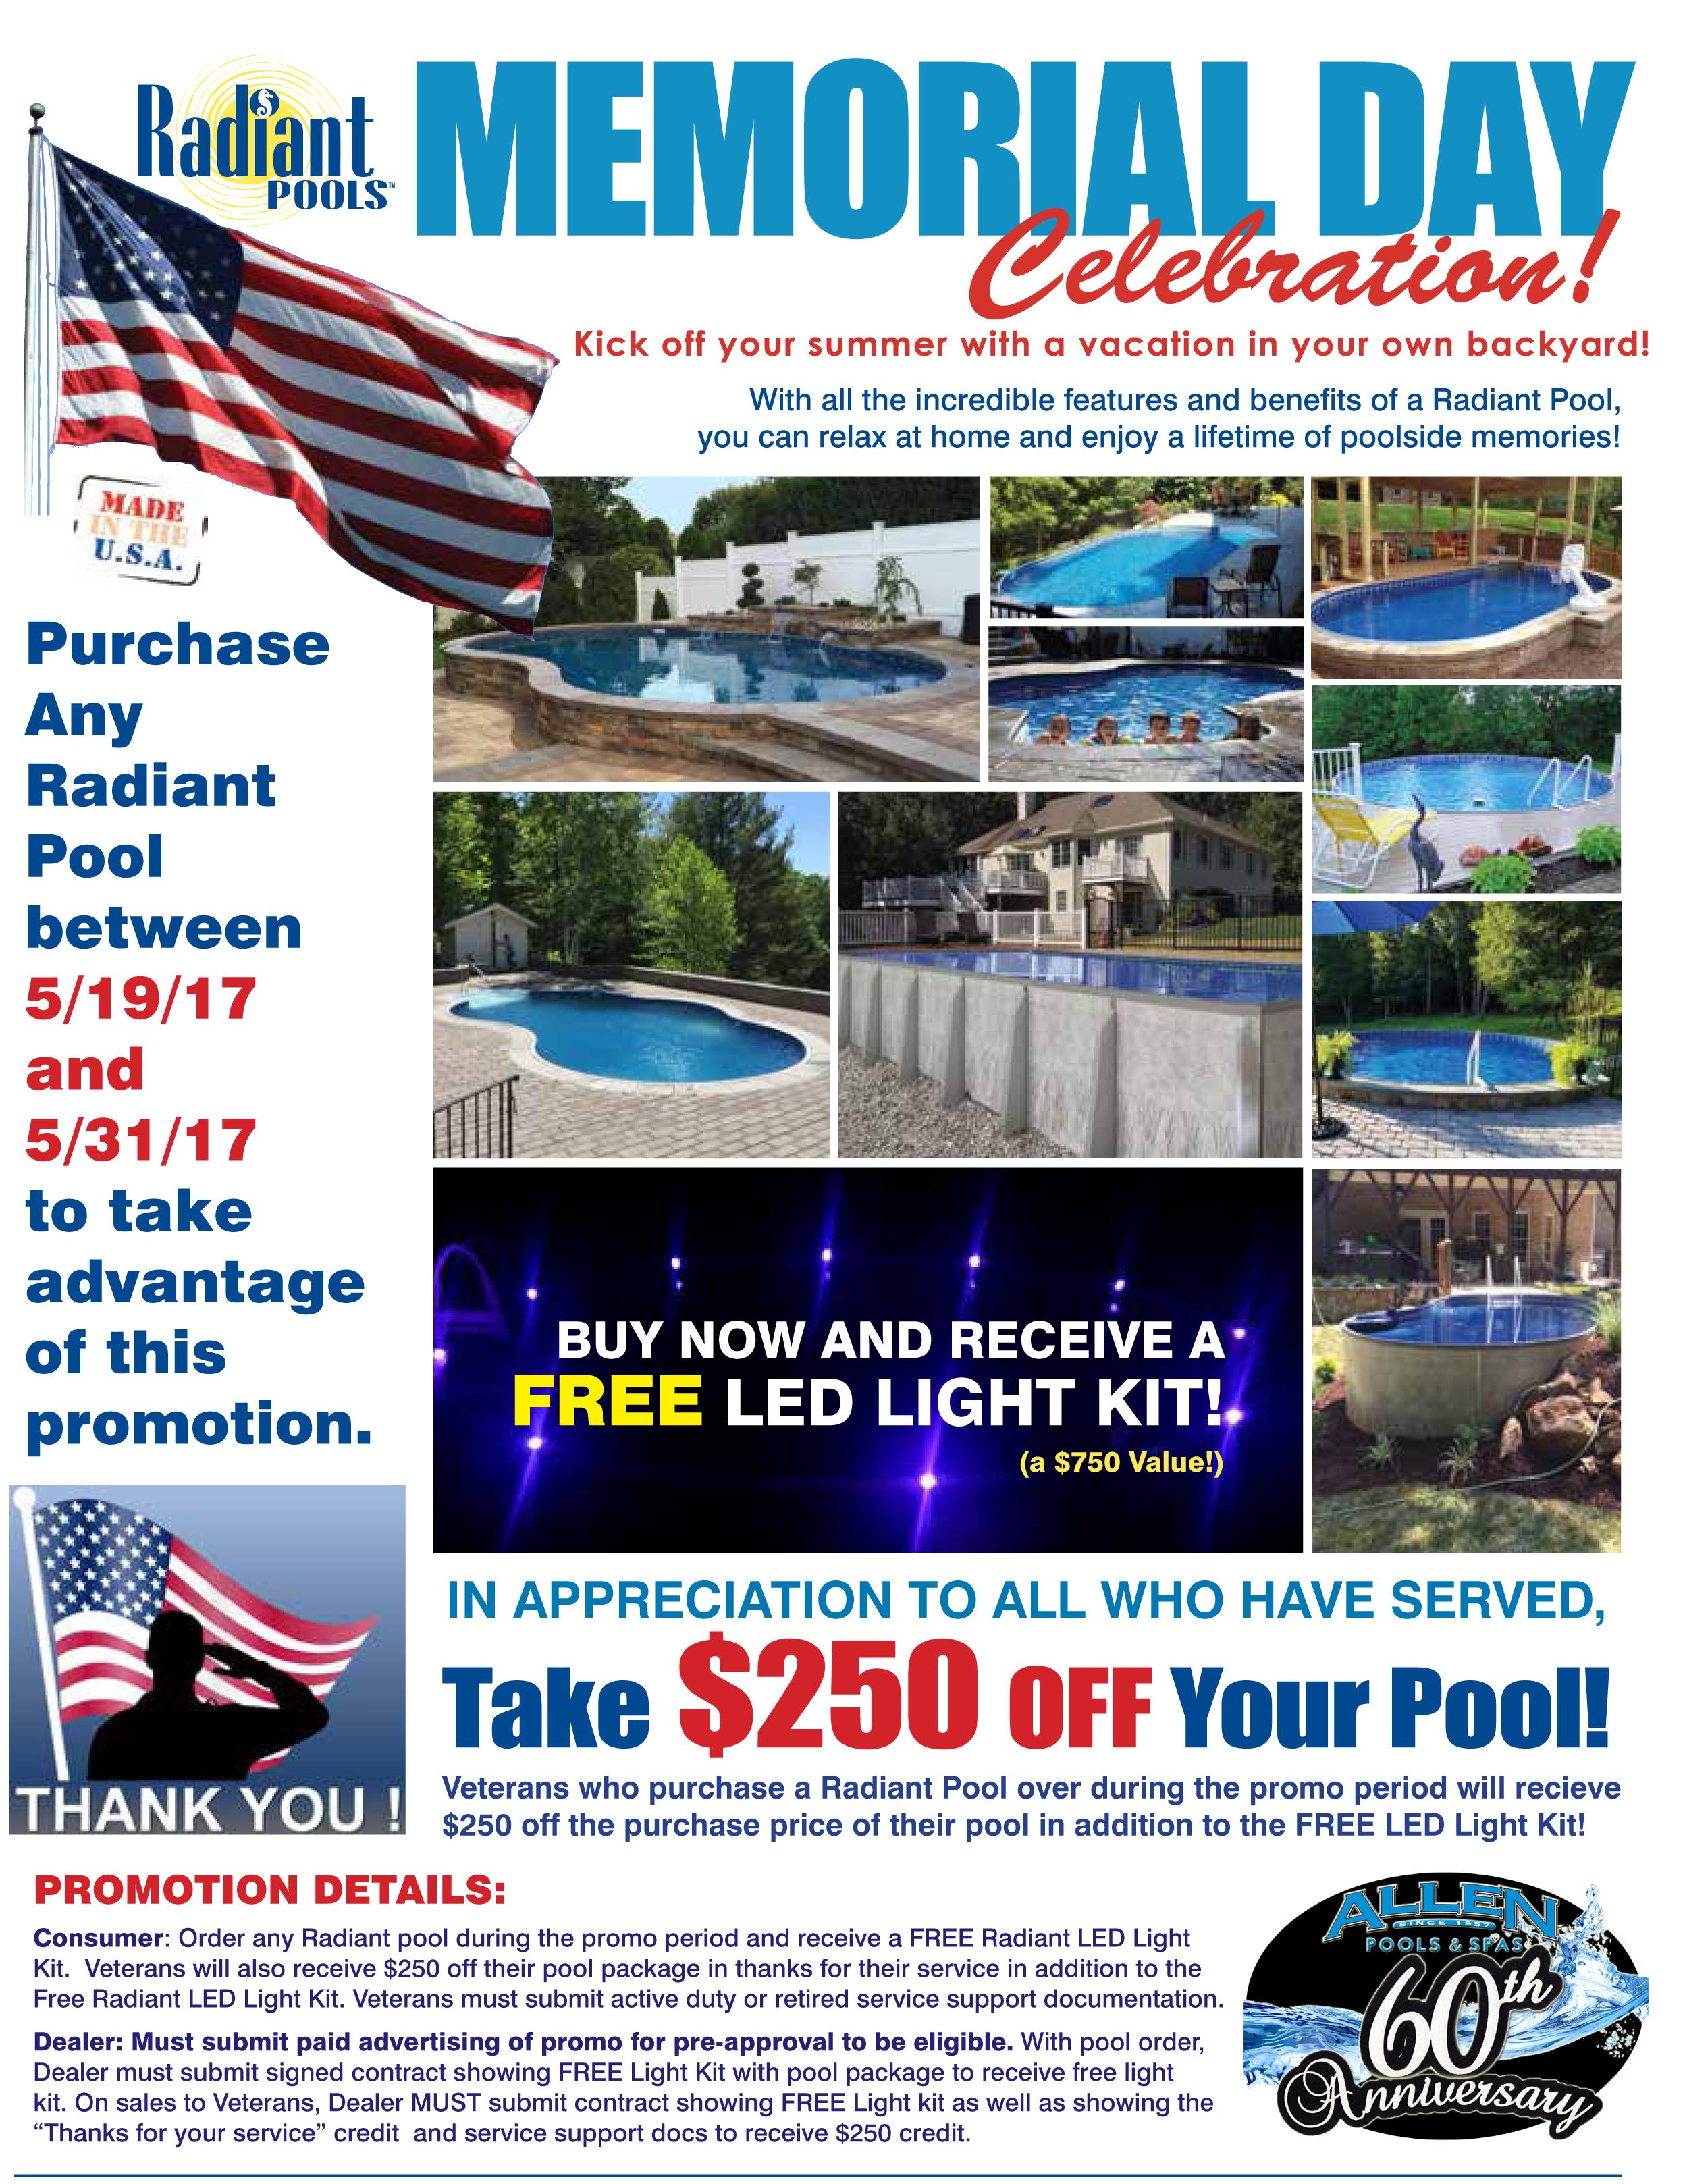 Radiant Pools Memorial Day Sale